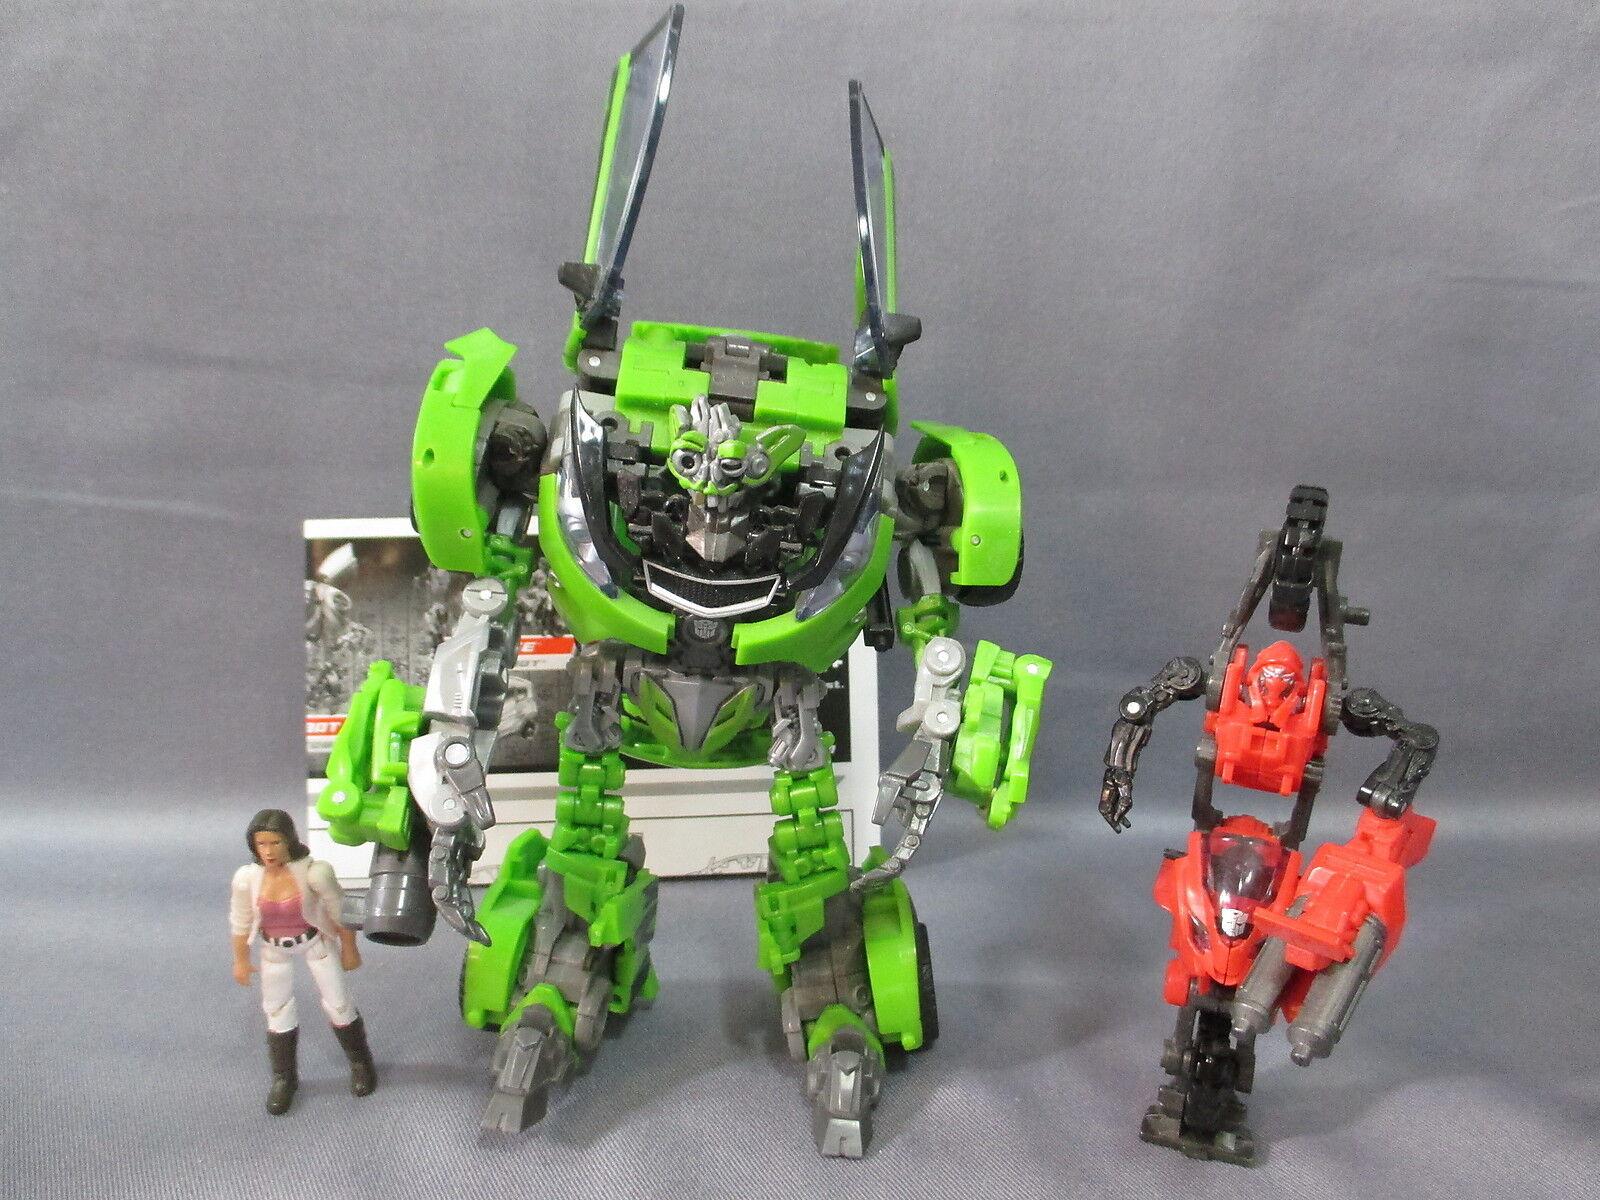 Transformers redF Movie  SKIDS, ARCEE & MIKAELA BANES  Human Alliance 2009